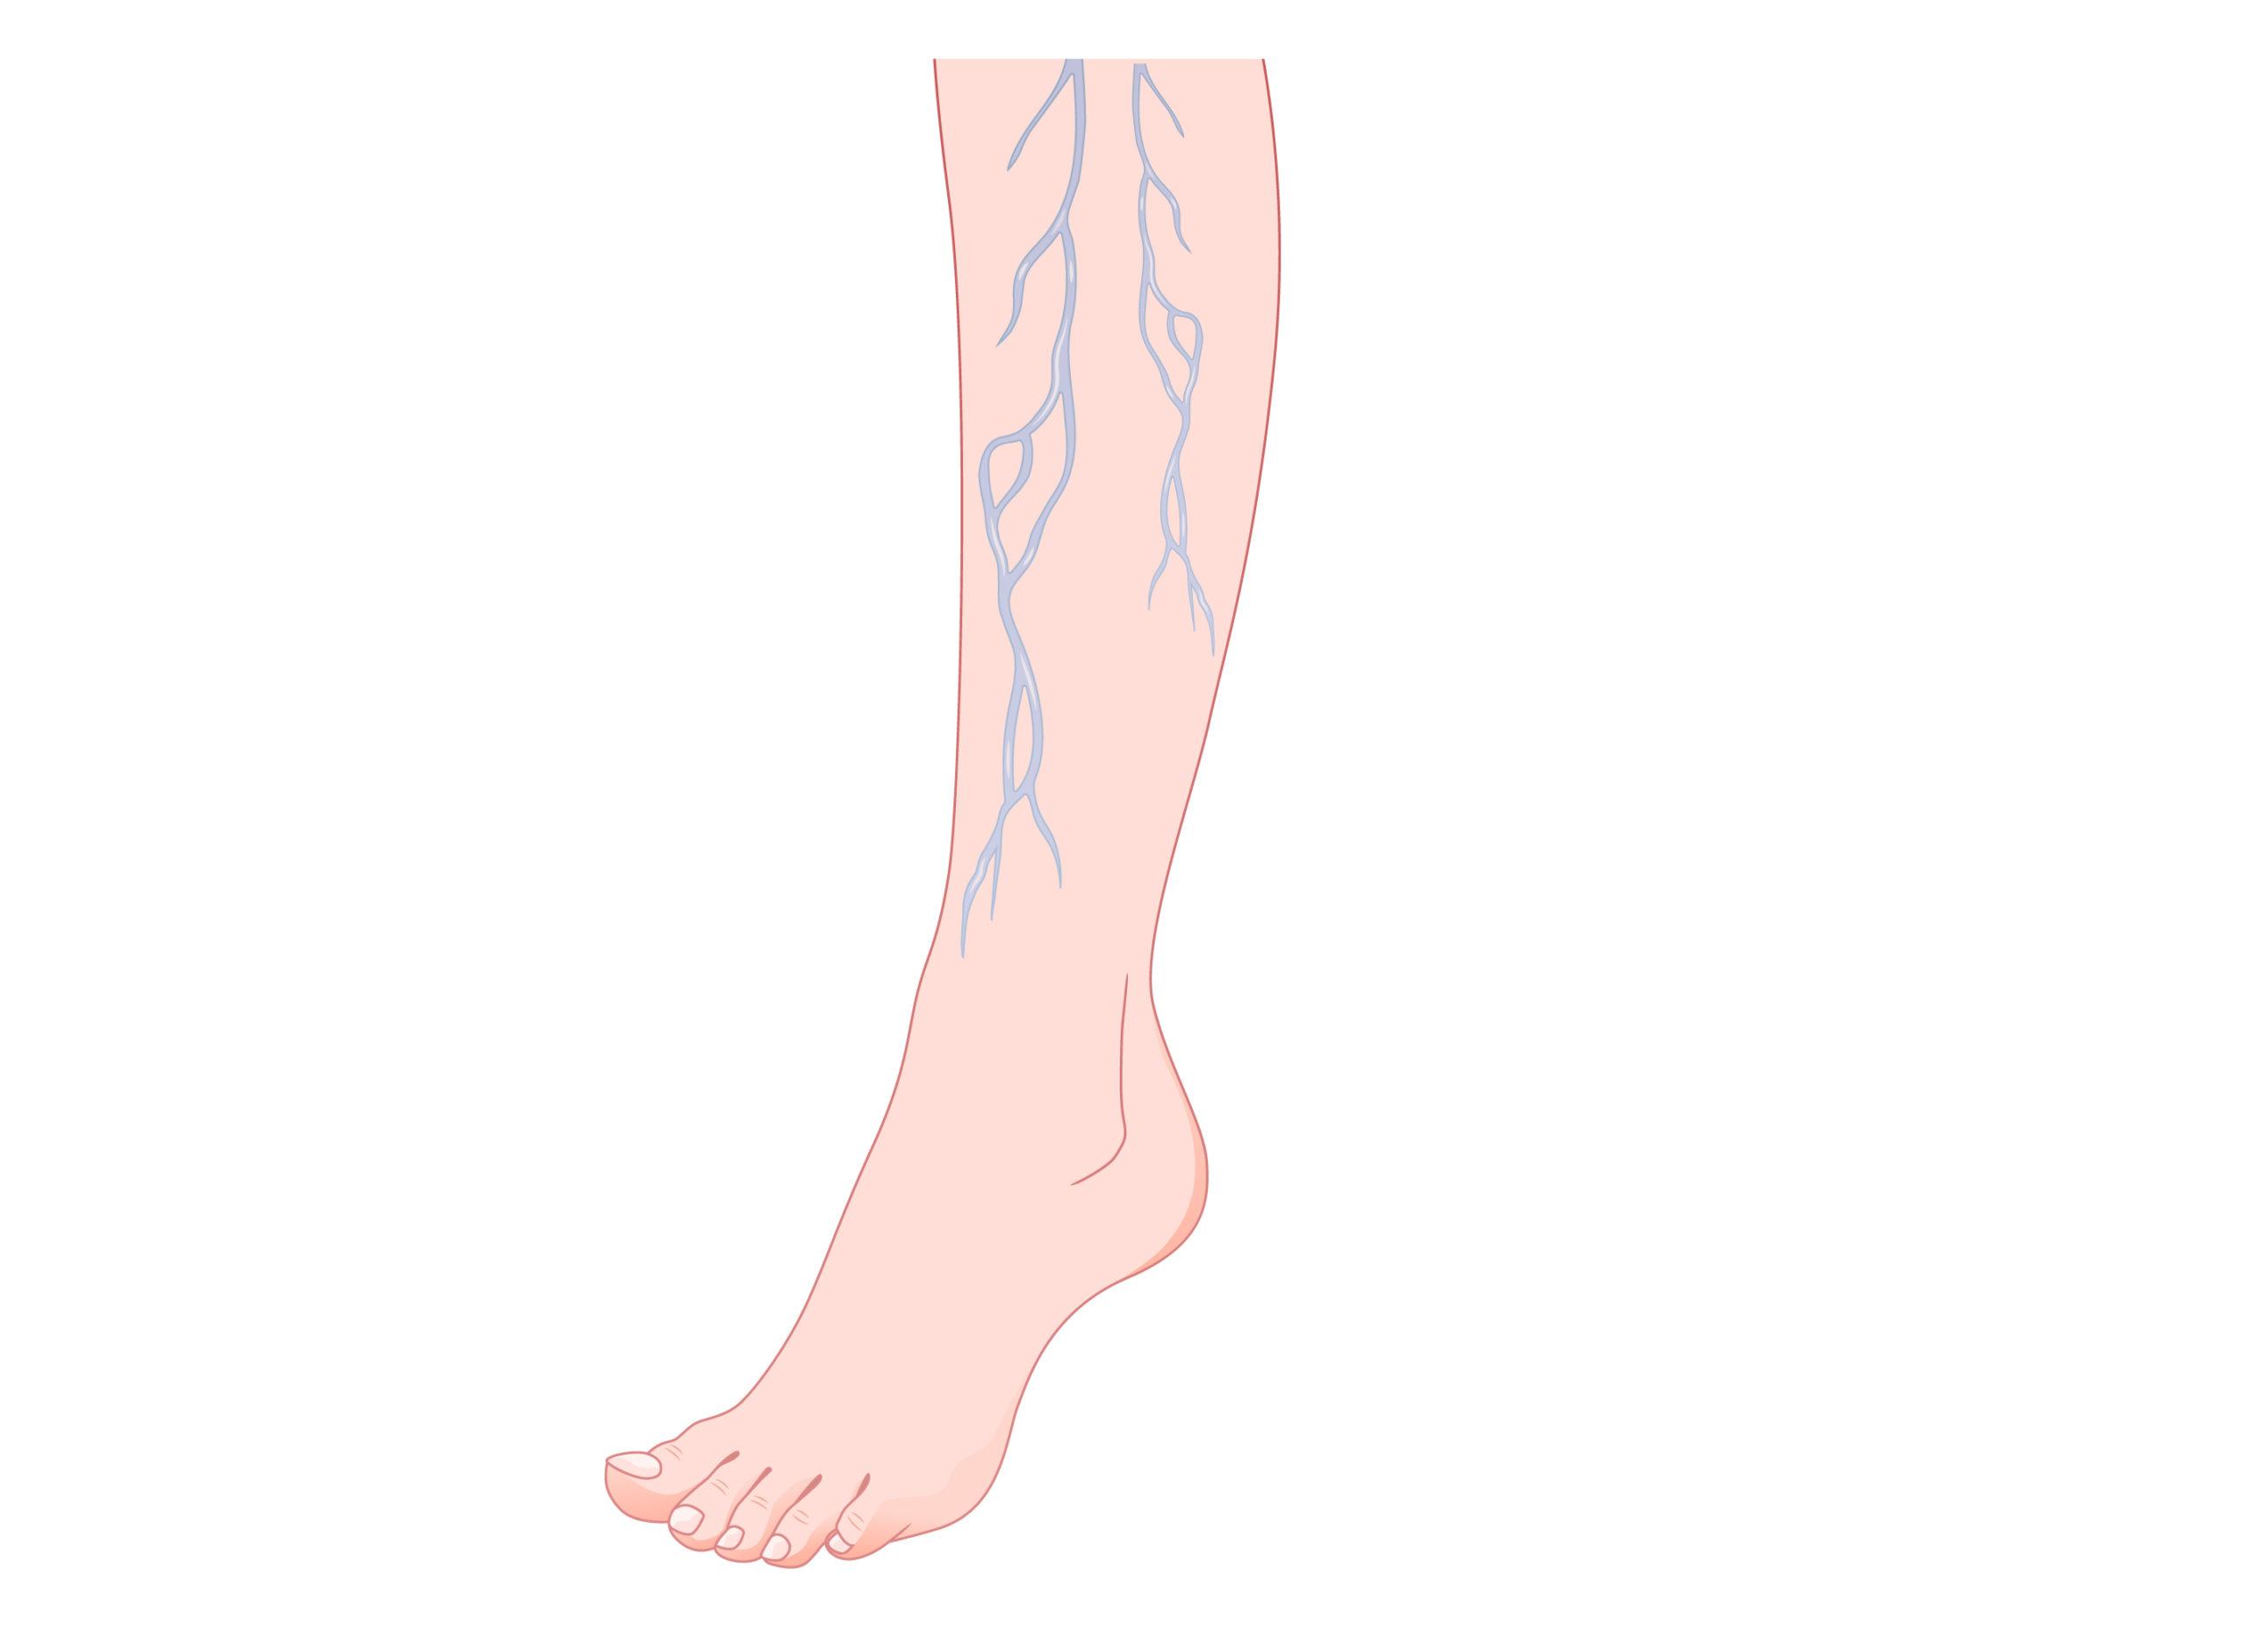 Varicen en piernas